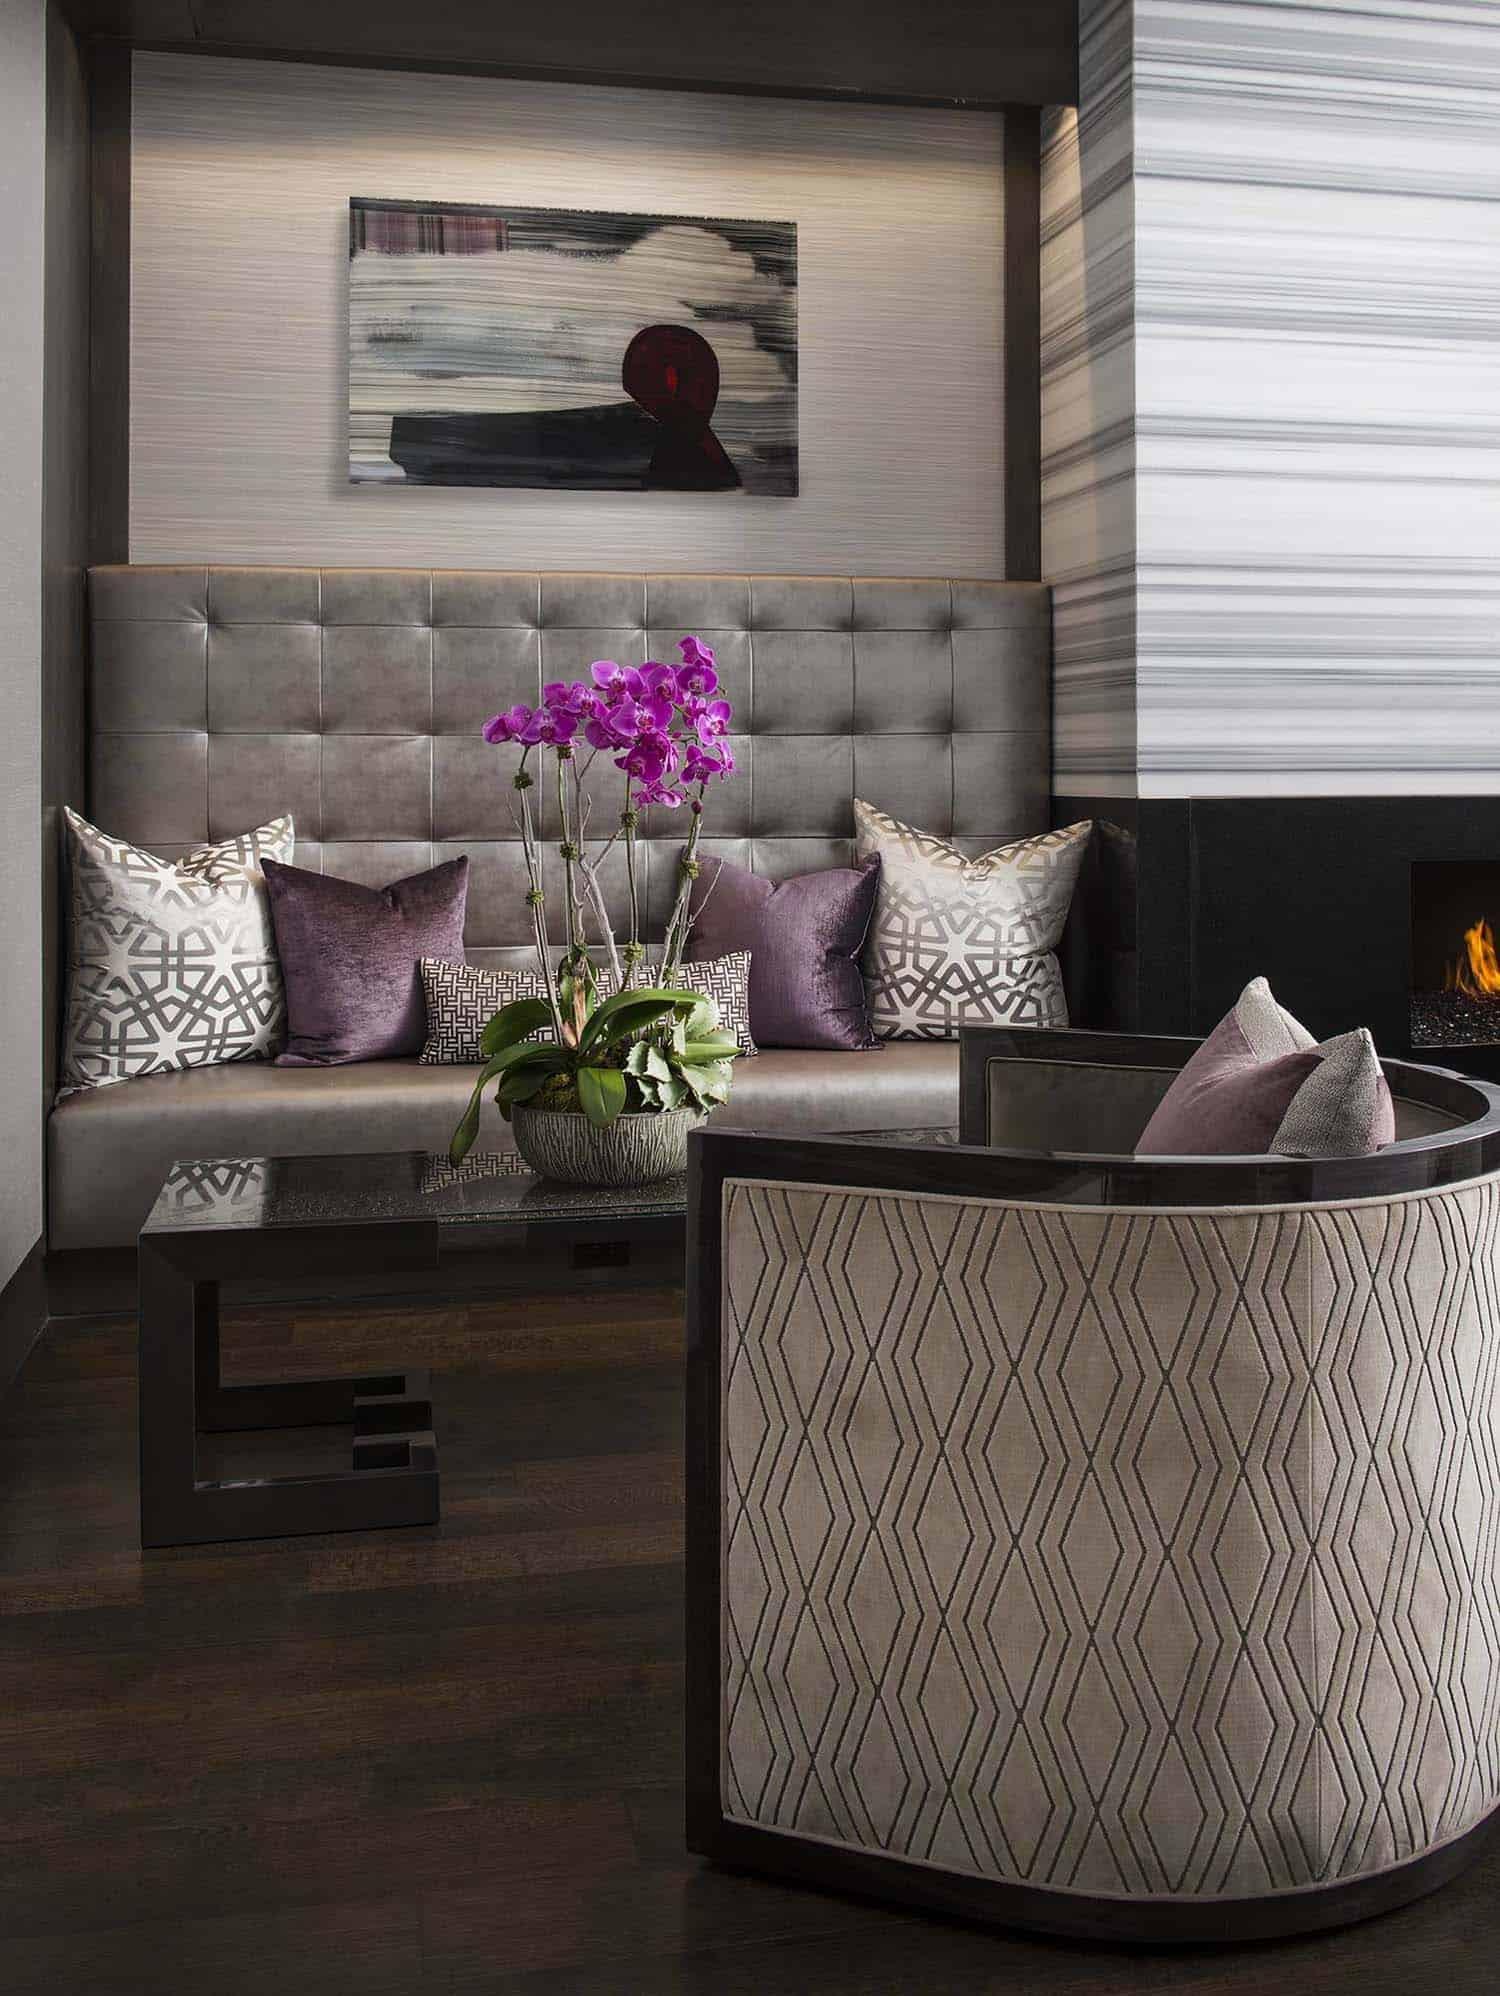 Contemporary Style Home-Dallas Design Group-16-1 Kindesign